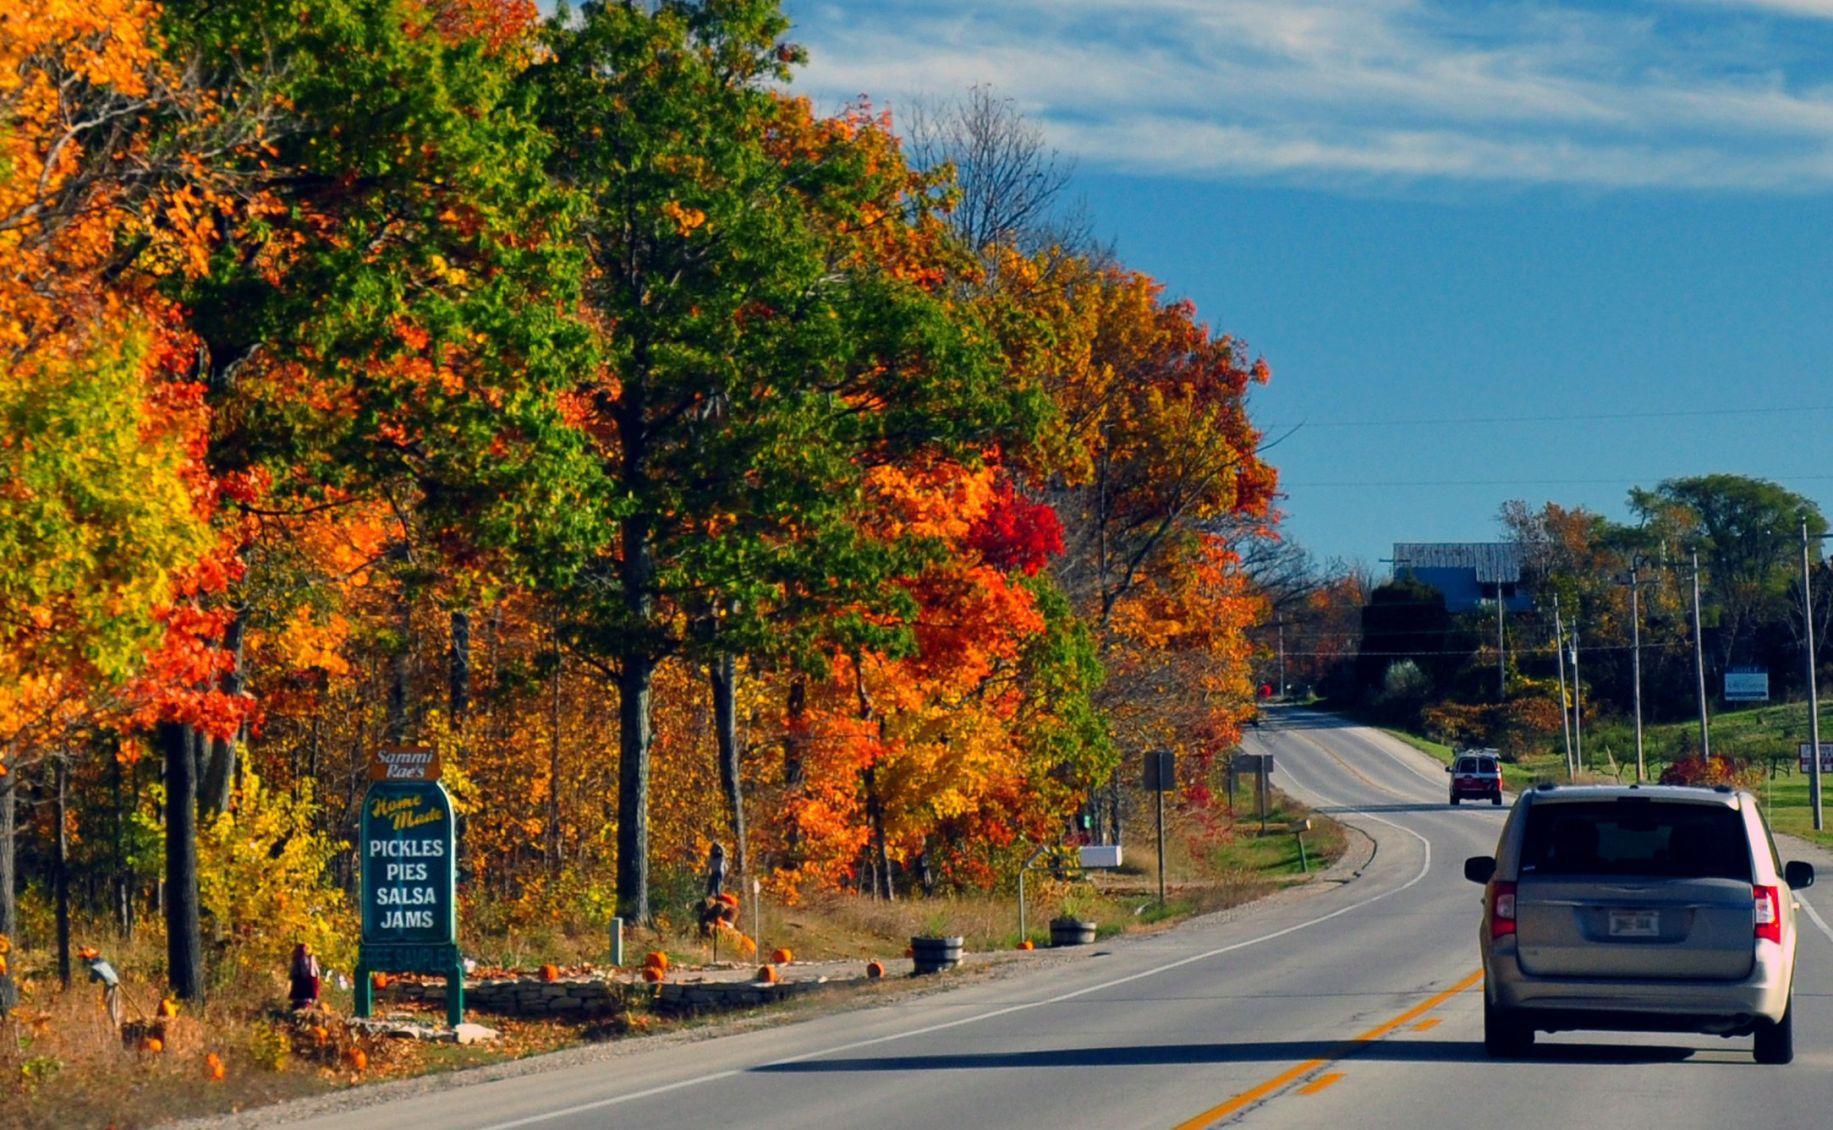 Wisconsinu0027s Door County & Fall foliage lights up Wisconsinu0027s Door County   Travel   stltoday.com pezcame.com